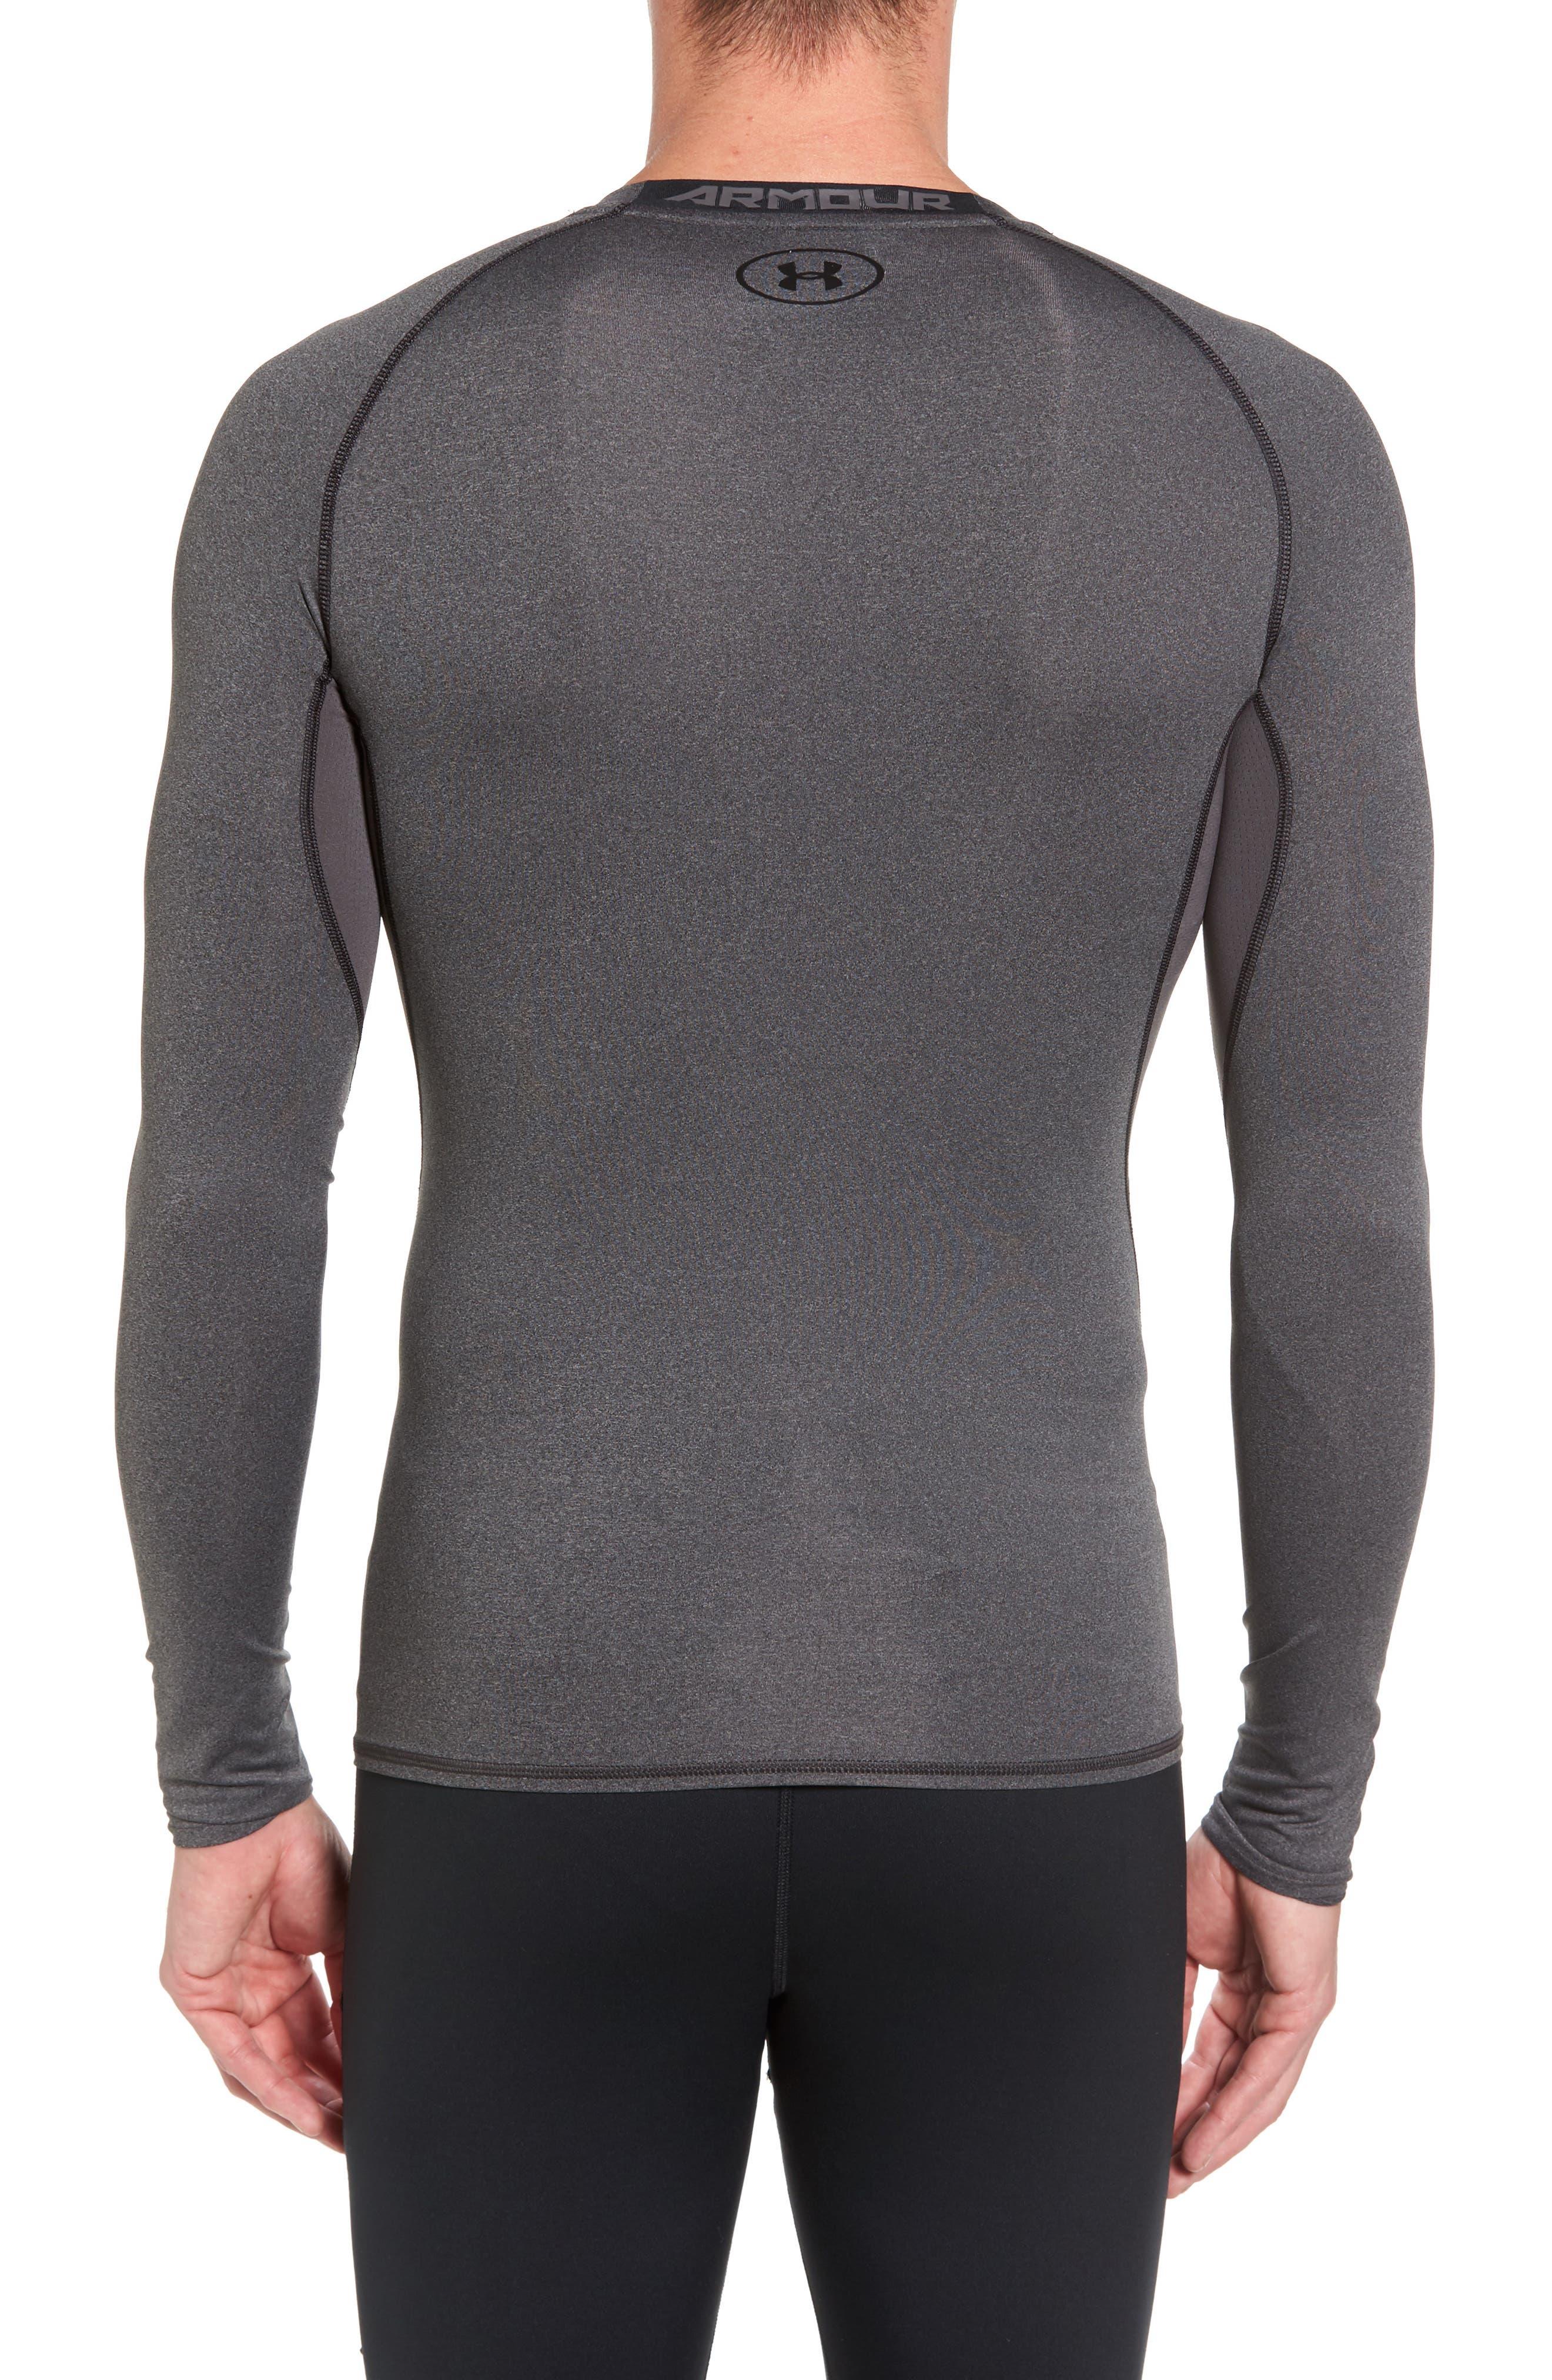 HeatGear<sup>®</sup> Compression Fit Long Sleeve T-Shirt,                             Alternate thumbnail 2, color,                             CARBON HEATHER/ BLACK